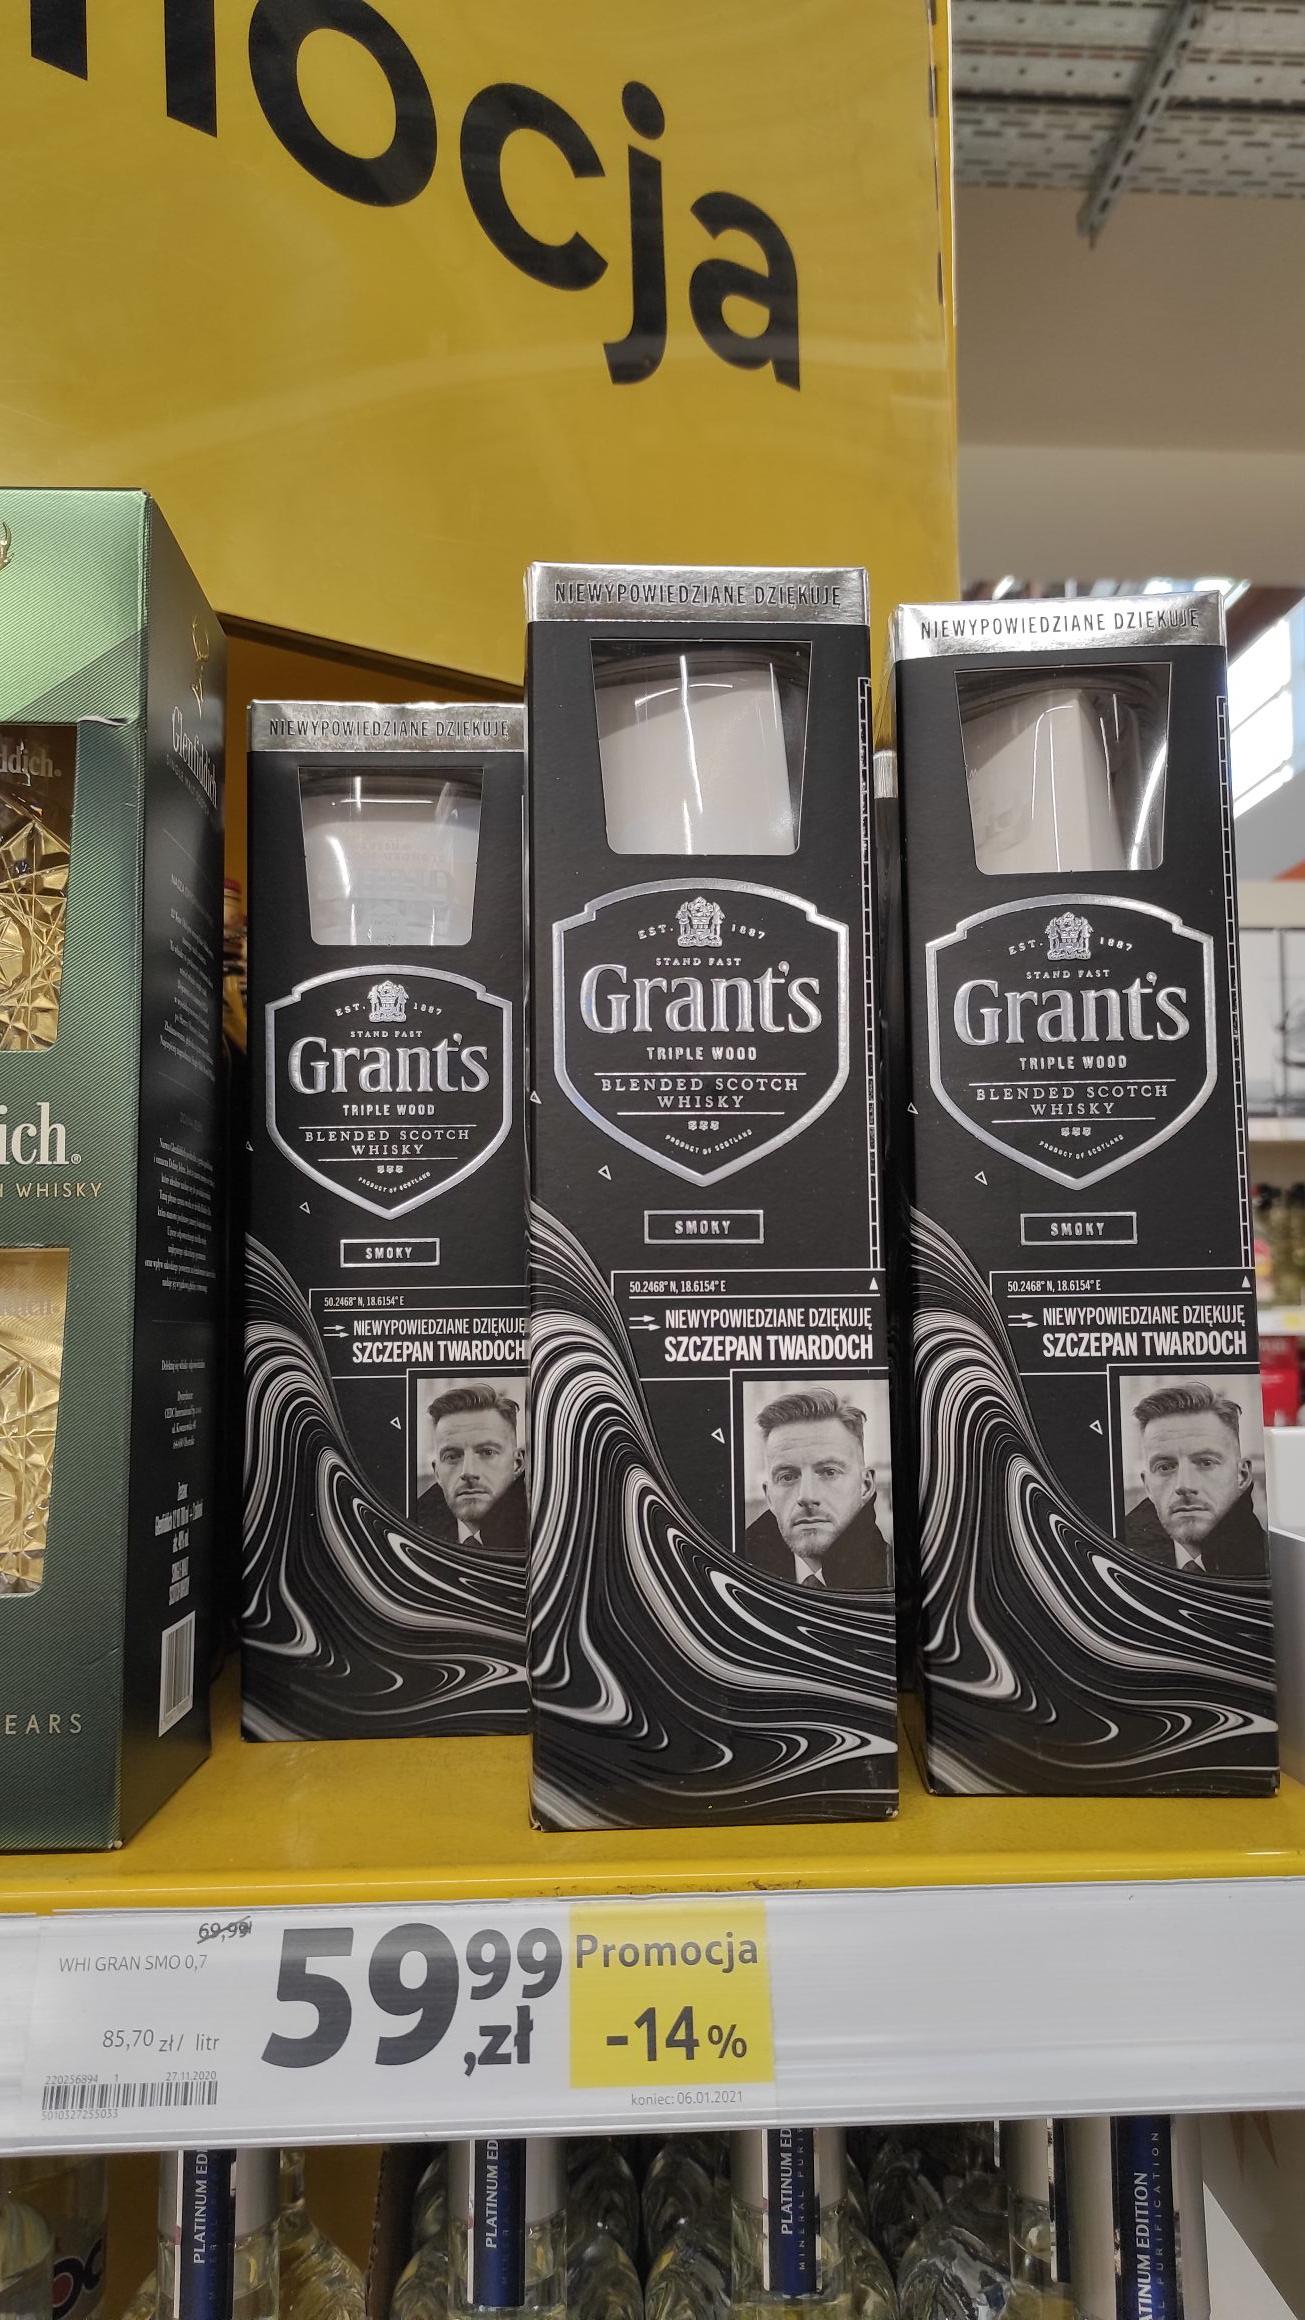 Whisky Grant's Triple Wood Smoky